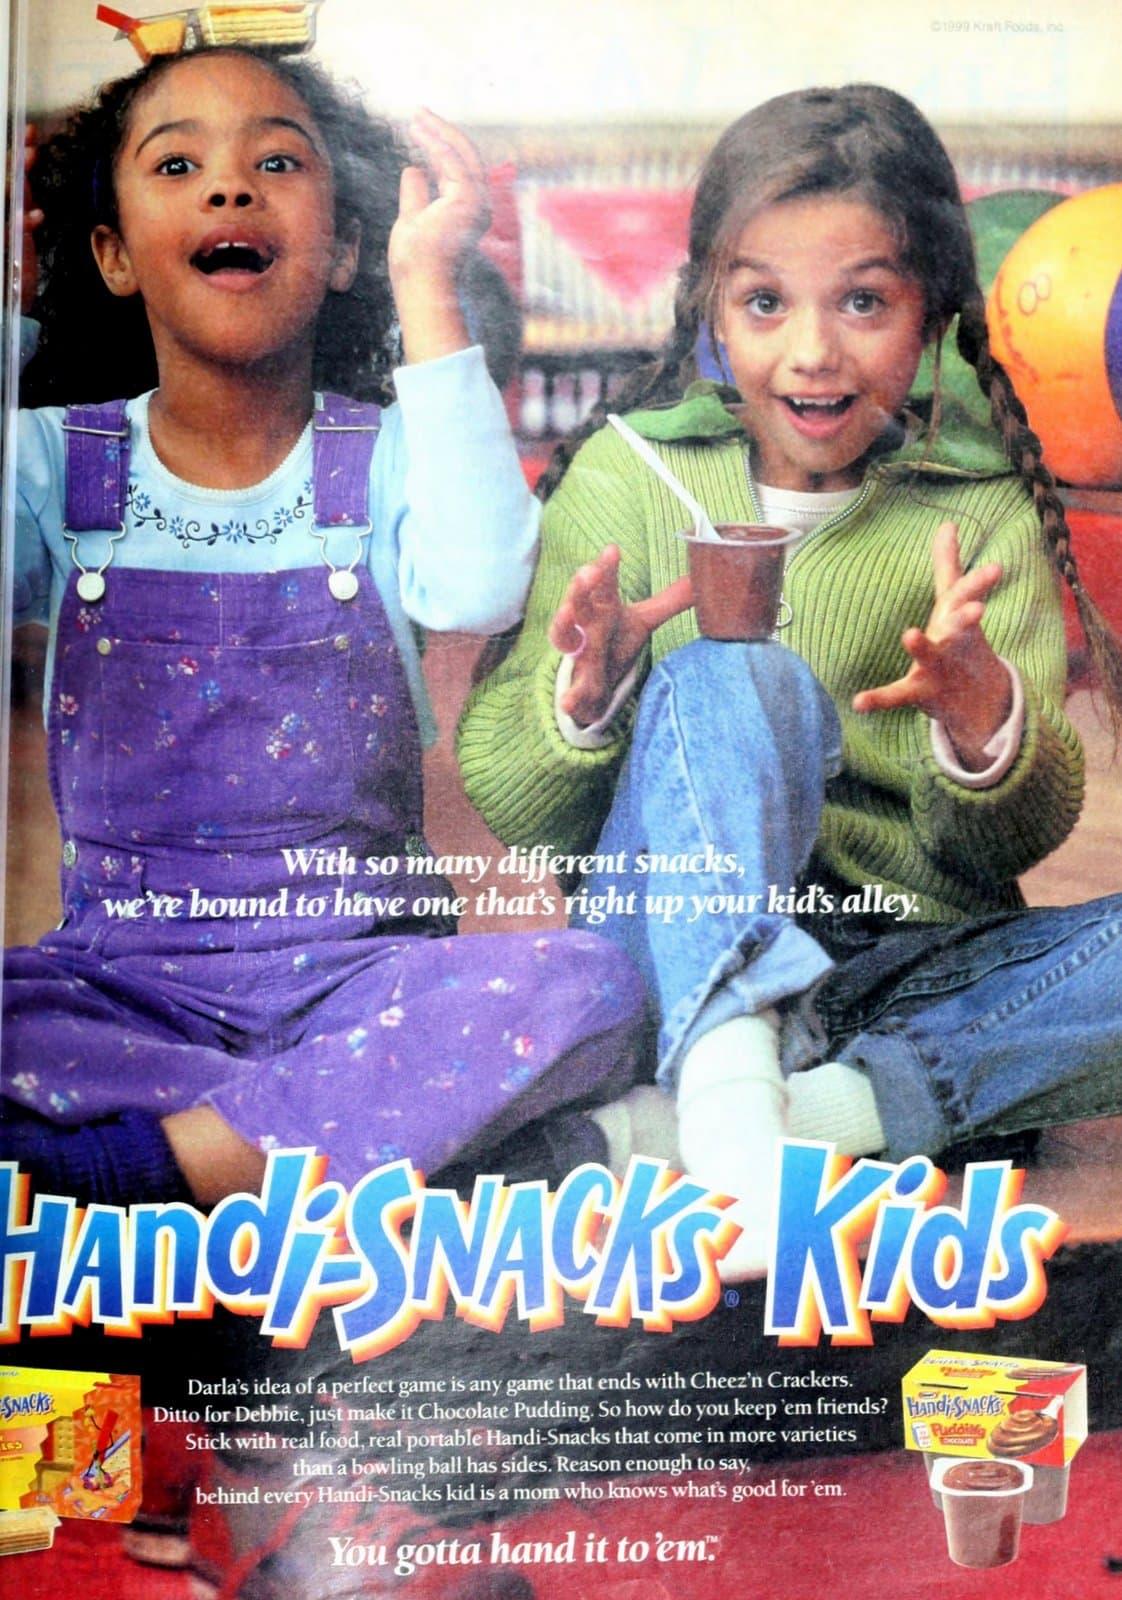 Handi-Snacks Kids chocolate pudding cups (1999)